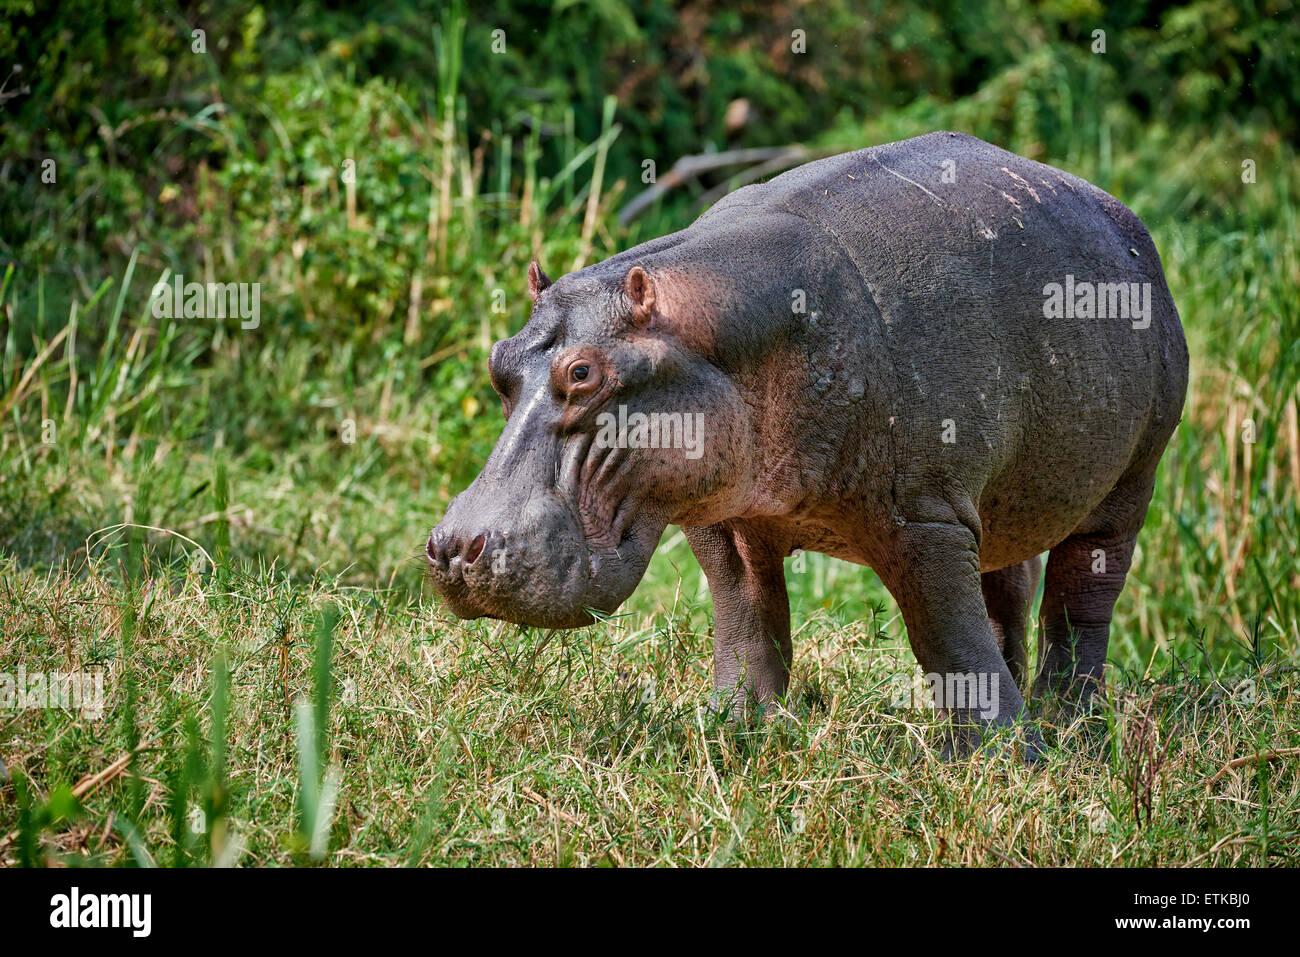 Ippopotamo, Hippopotamus amphibius, Canale Kazinga, Queen Elizabeth National Park, Uganda, Africa Immagini Stock